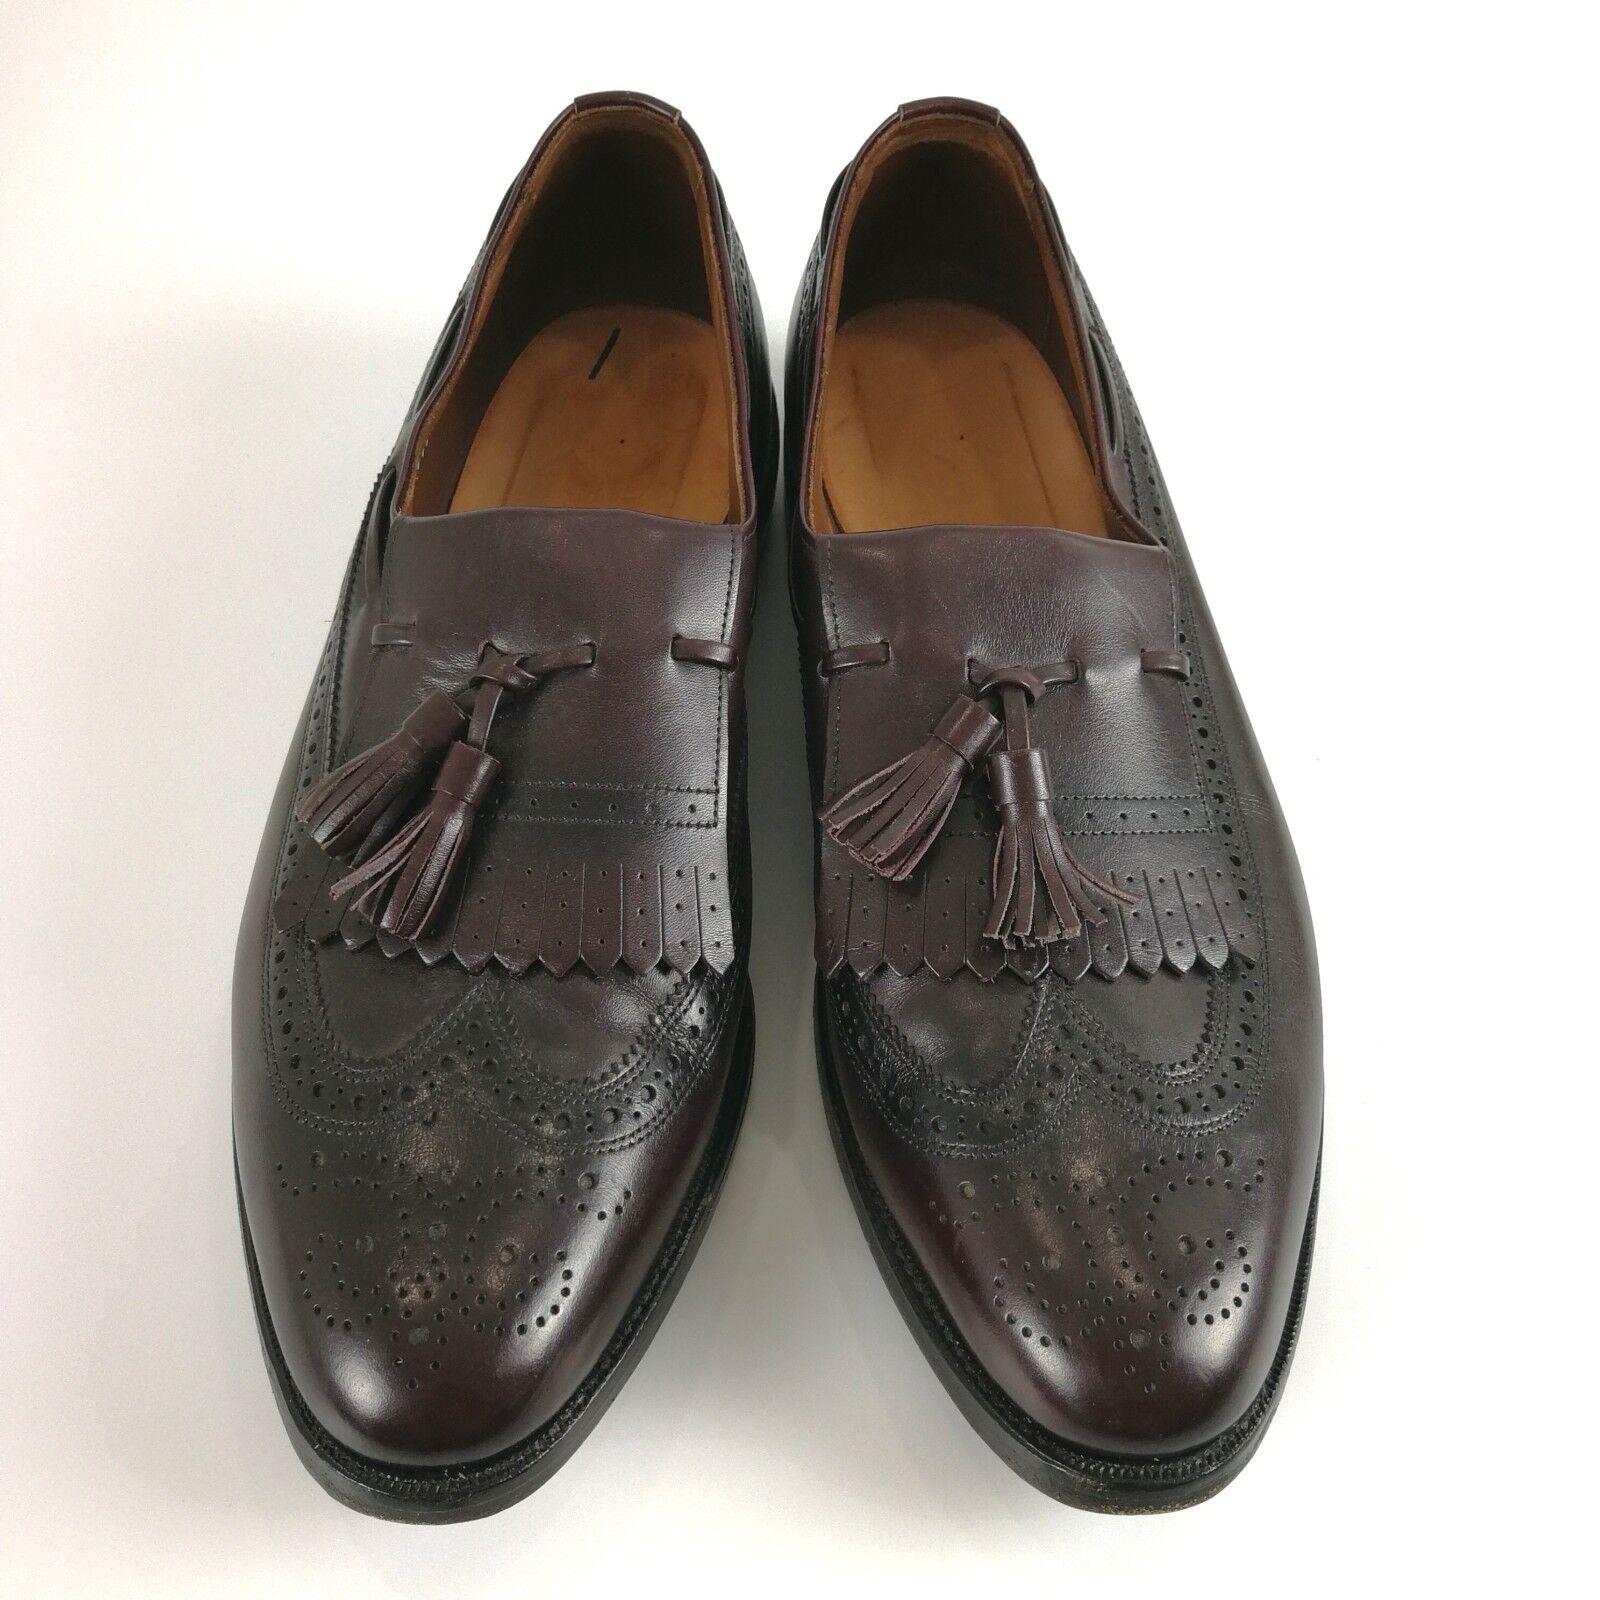 Allen Edmonds Arlington Burgundy Brogue 11.5 C Leather Tassel Loafers